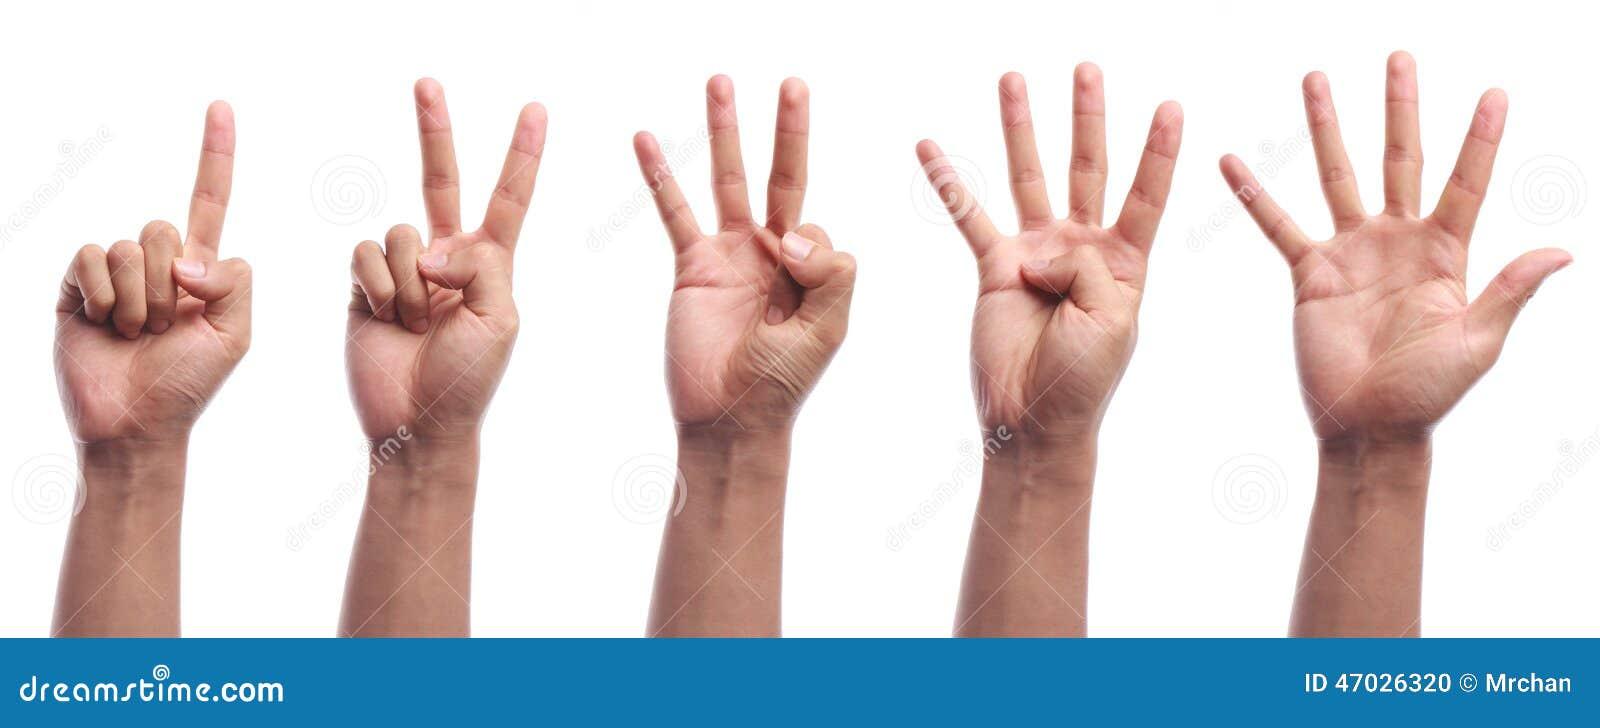 five fingers ????? ???????